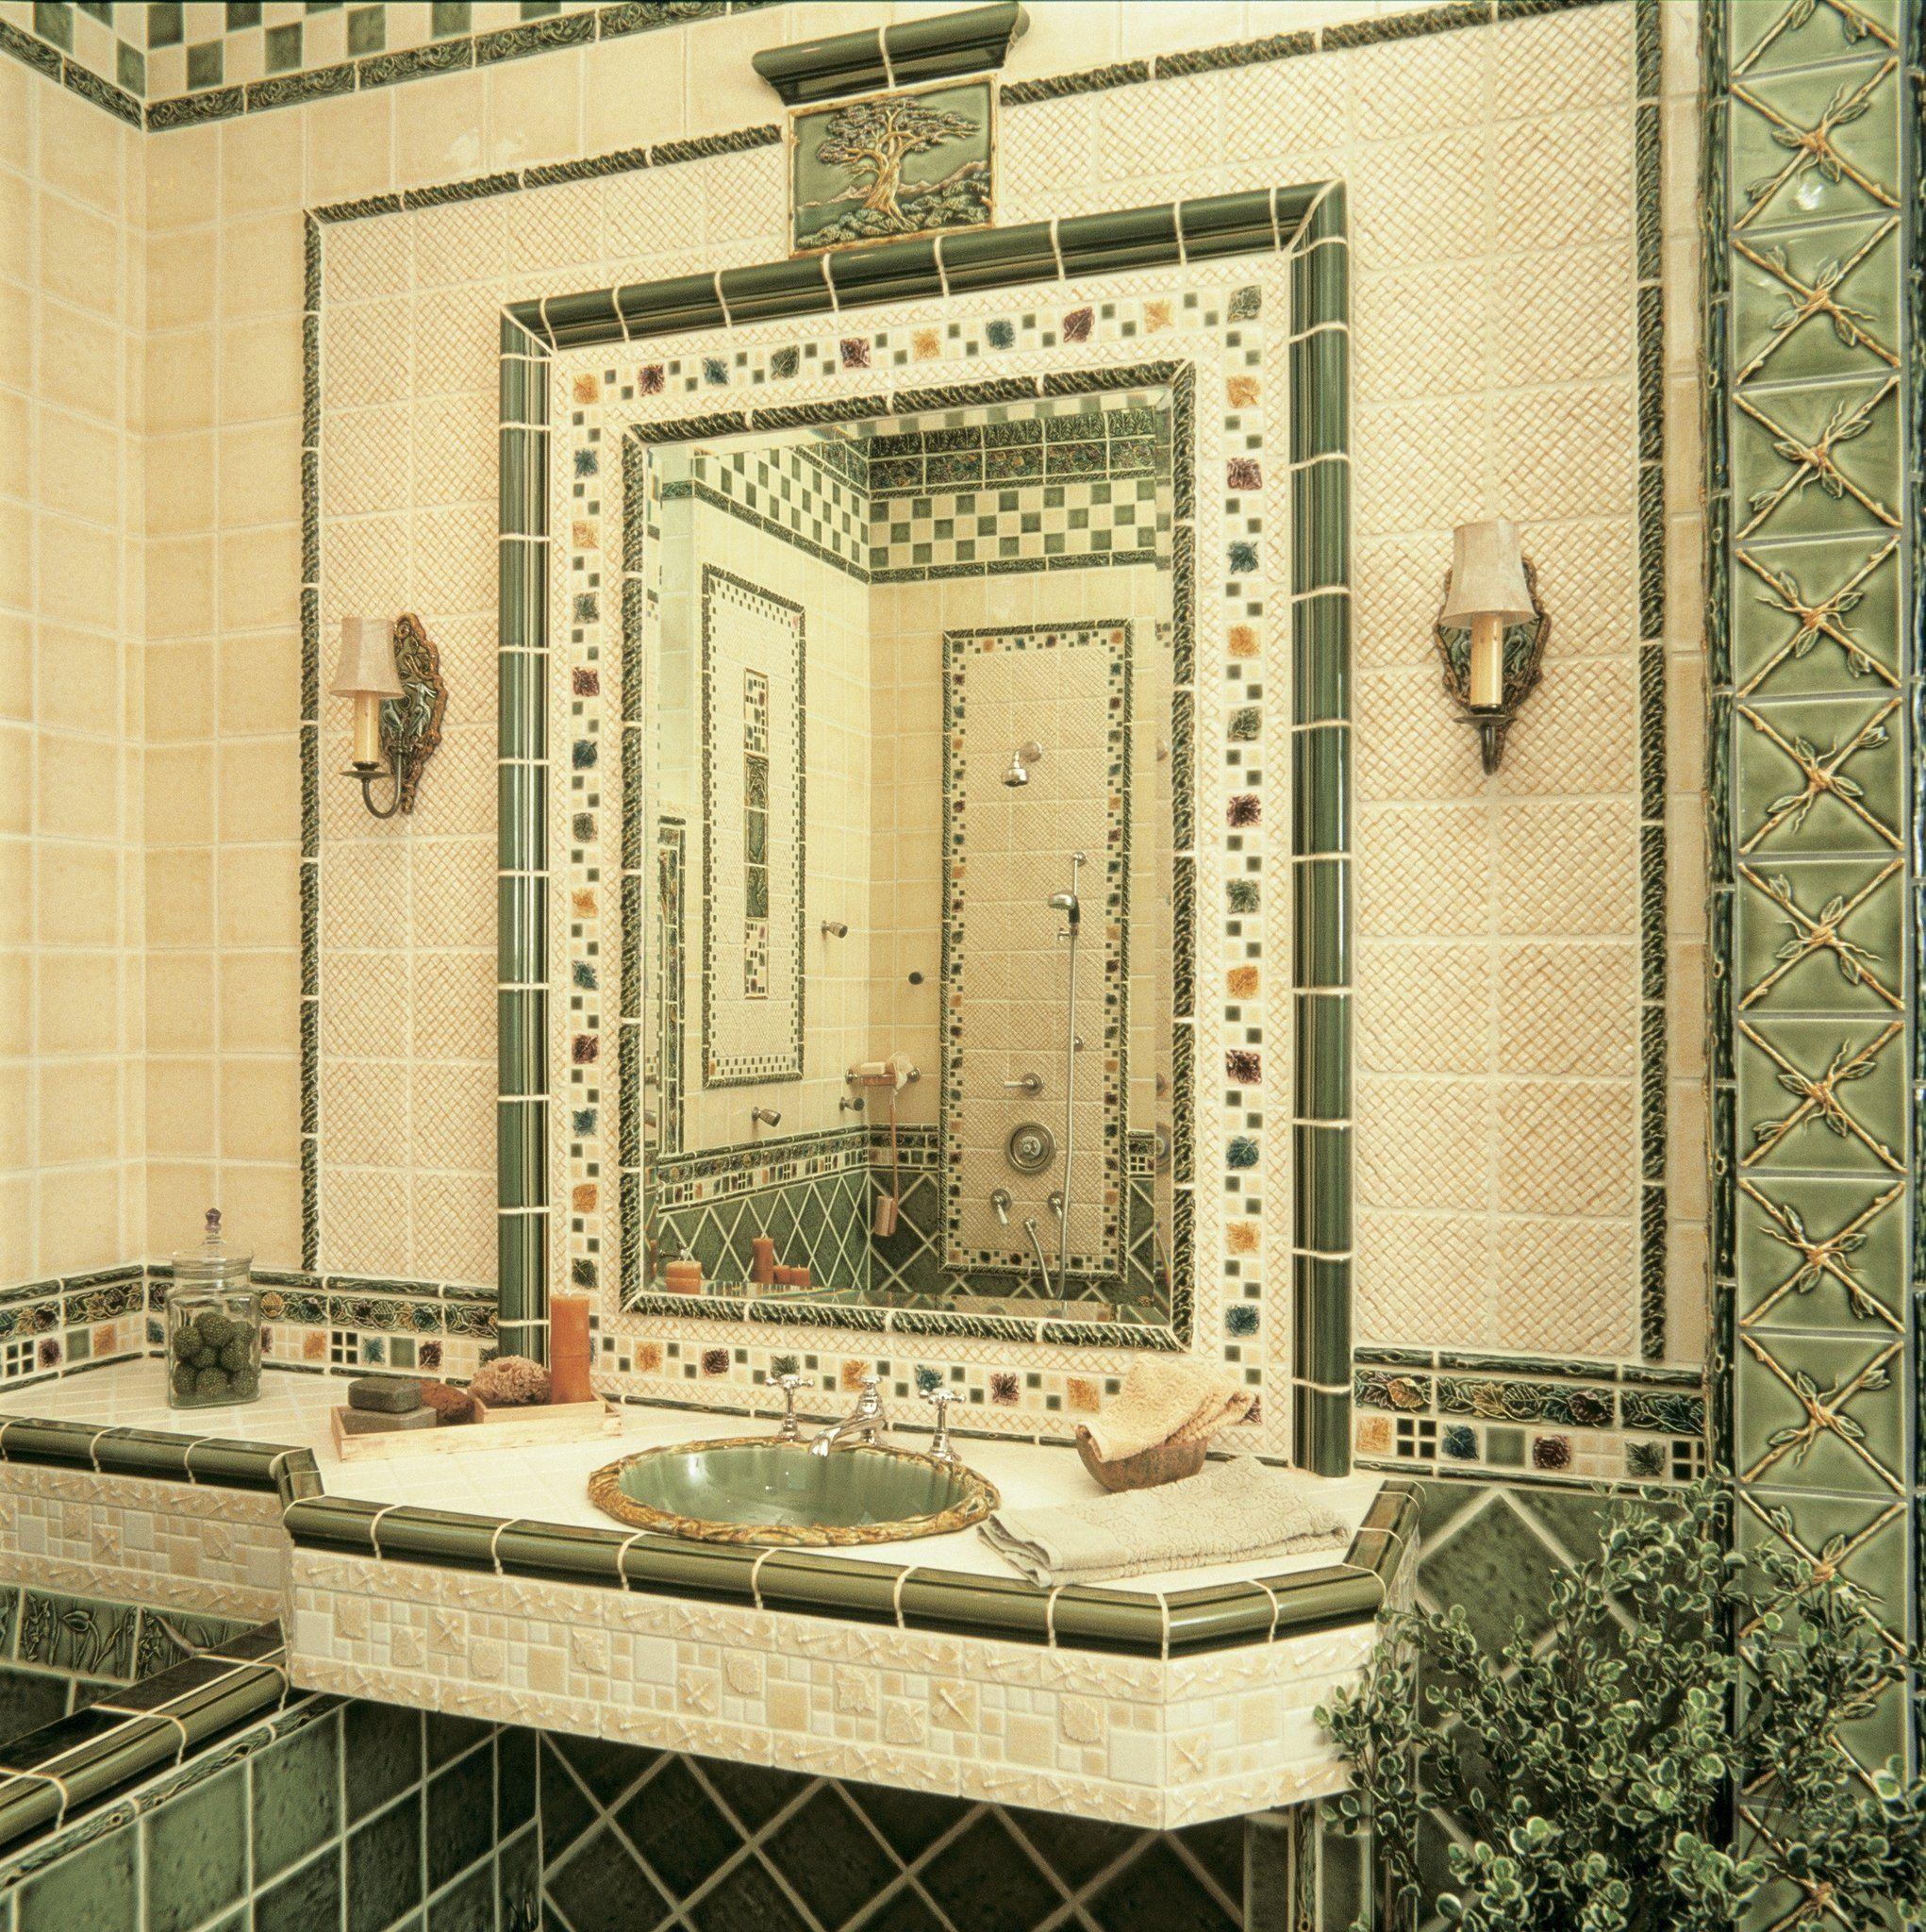 Portland tile-makers Pratt & Larson stay true to the craft ...